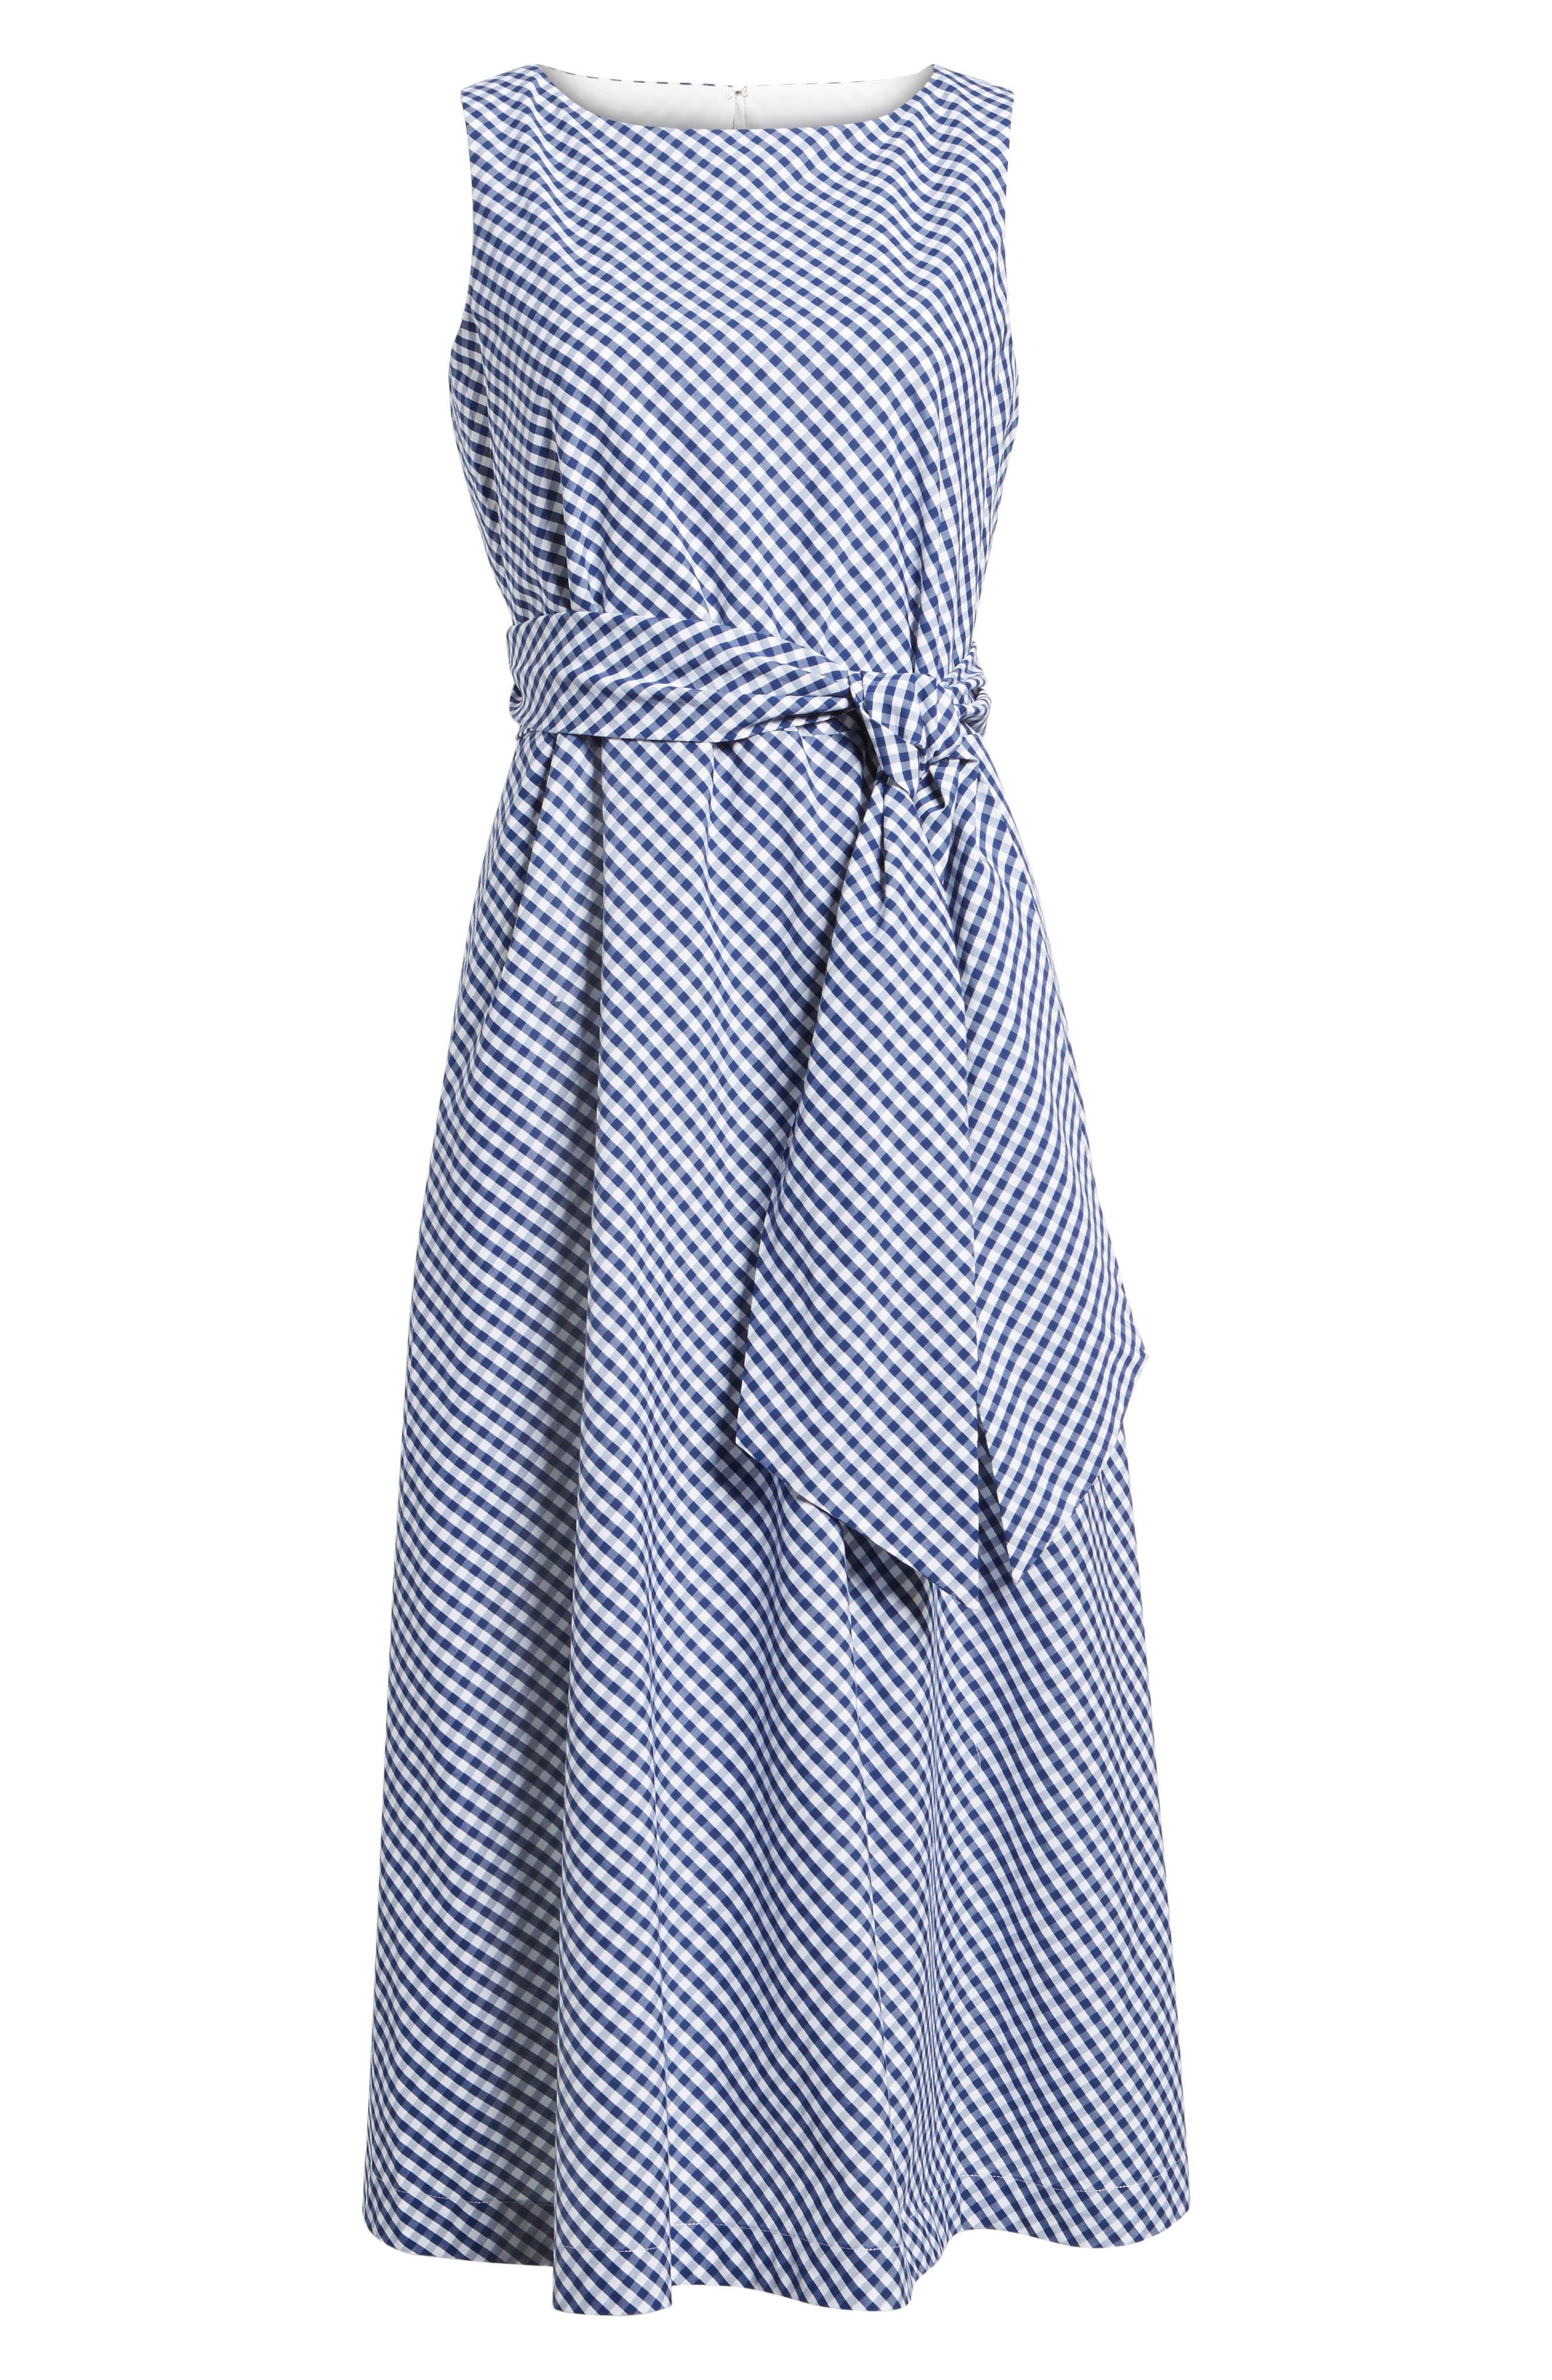 Cotton Gingham Midi Dress,                             Alternate thumbnail 6, color,                             400